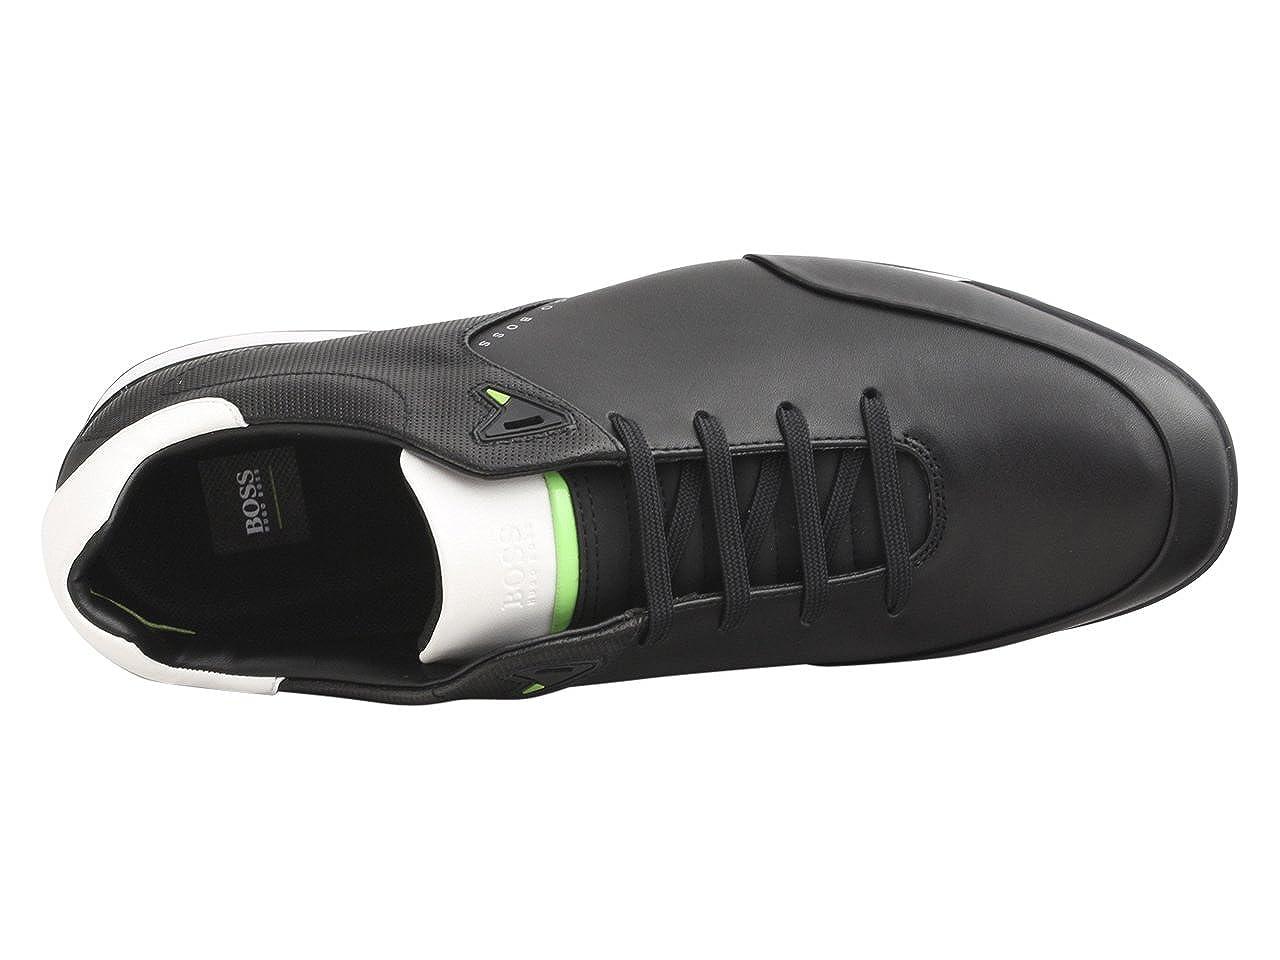 Hugo Boss Mens Saturn Trainers Sneakers Shoes